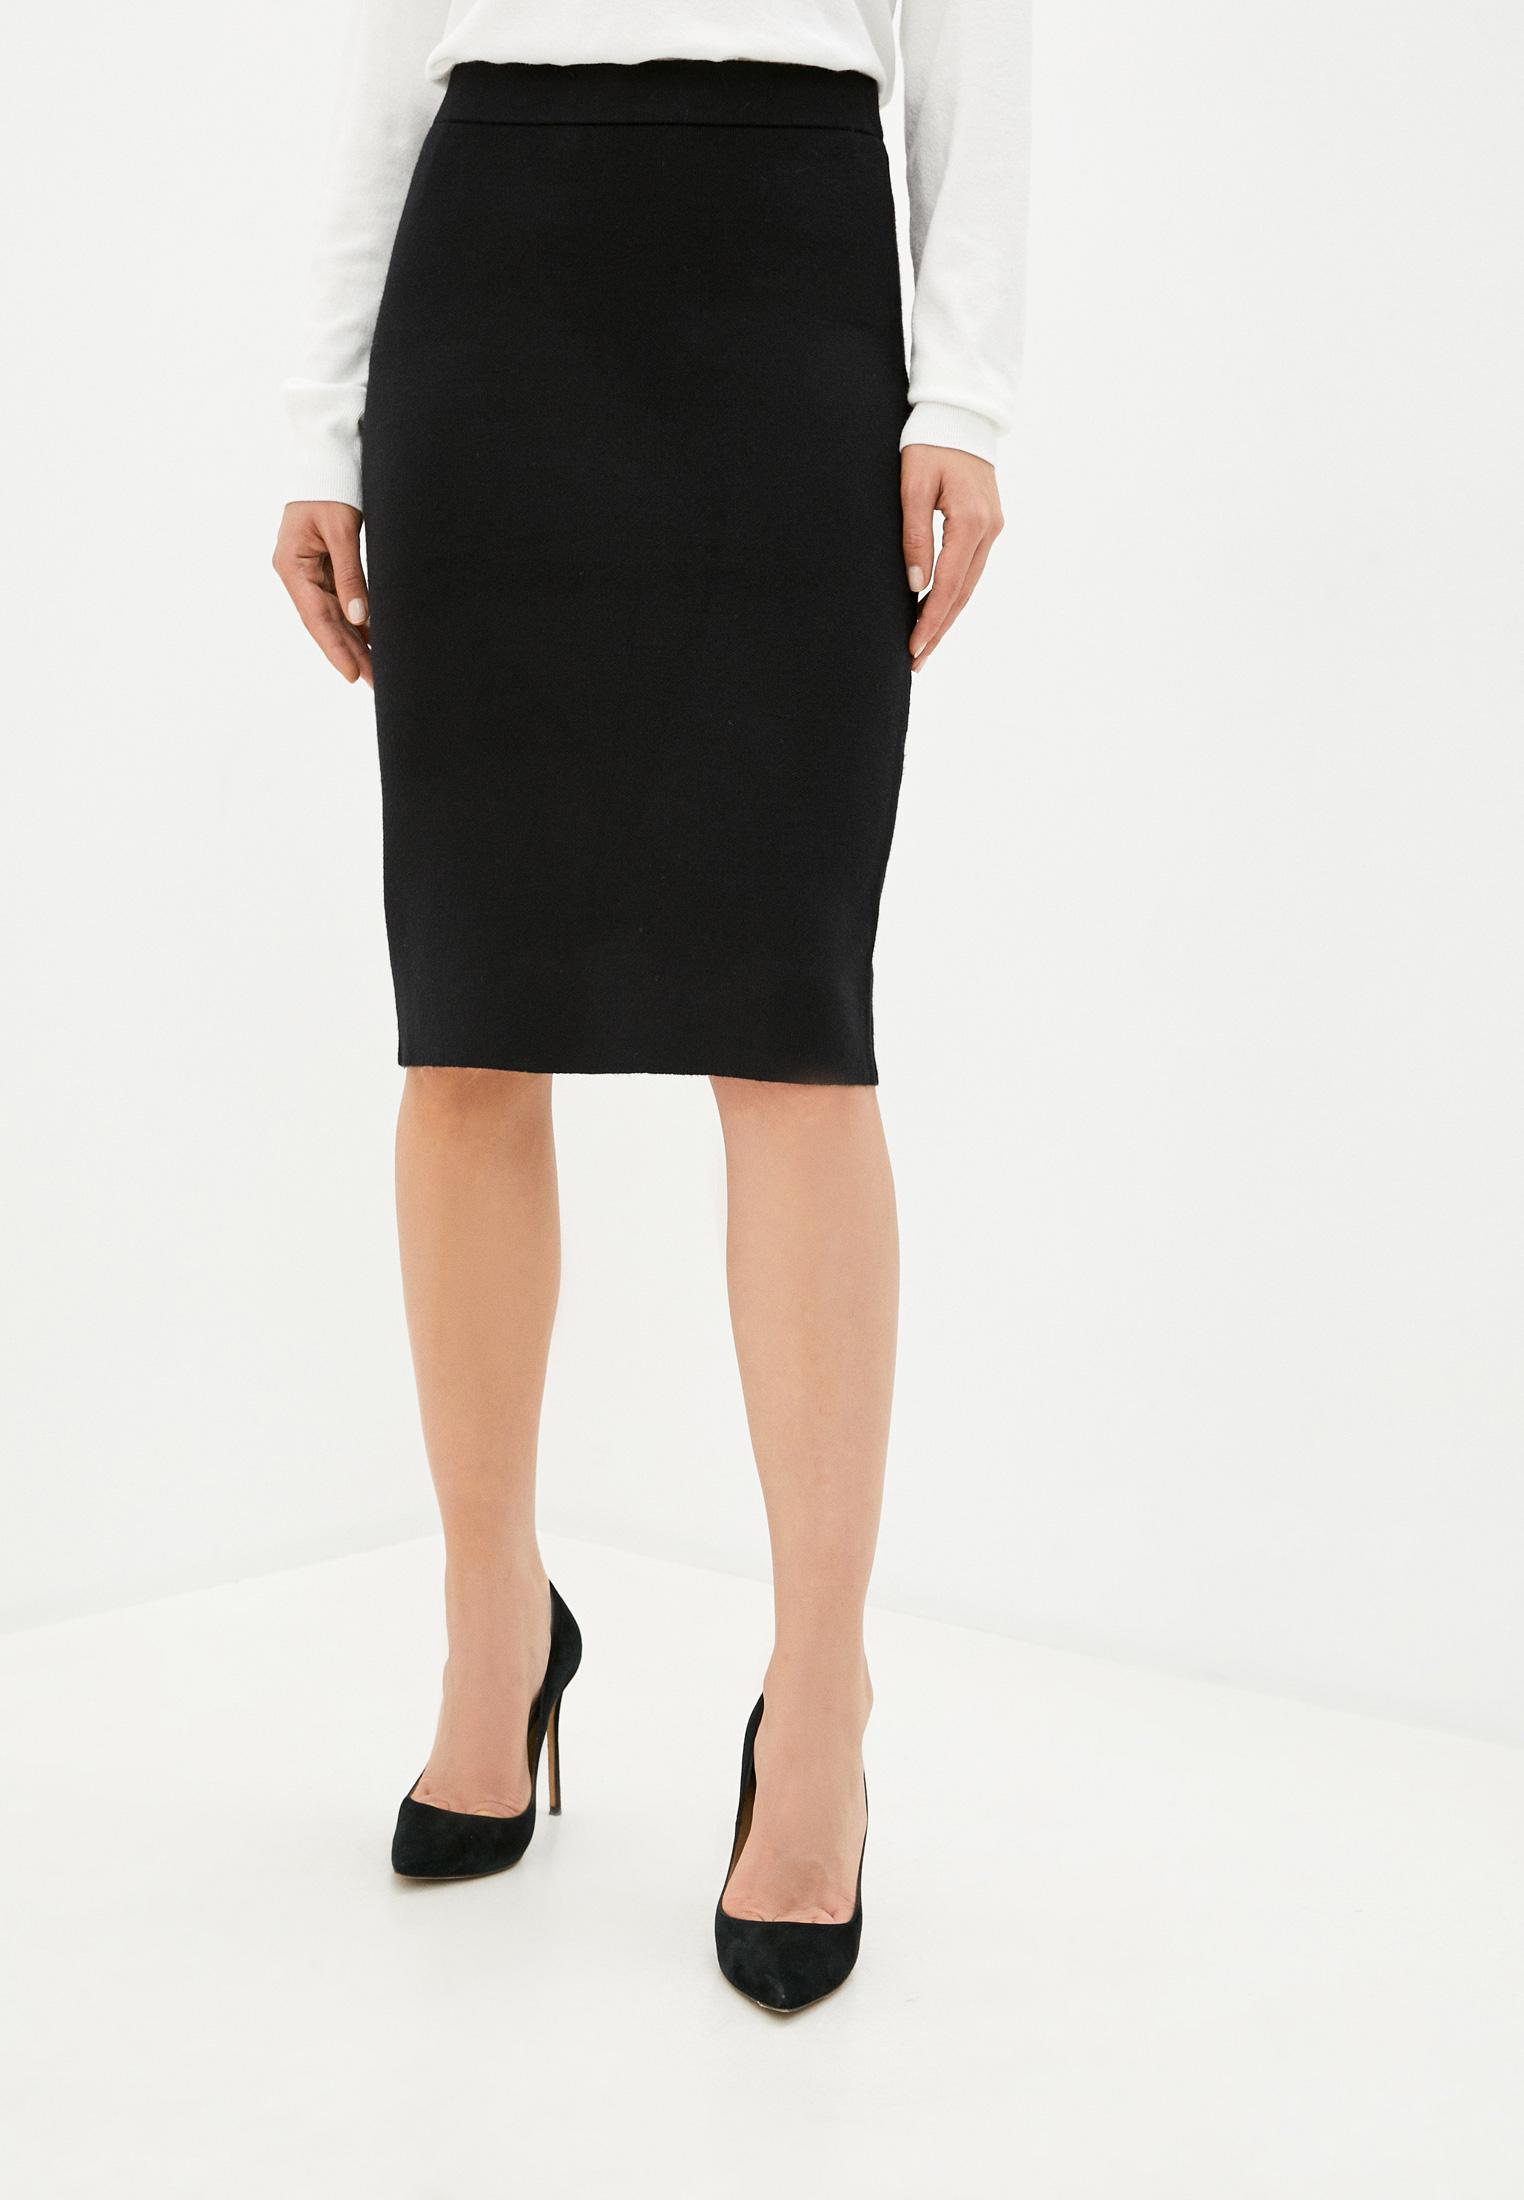 Узкая юбка Zolla LJ77001_01